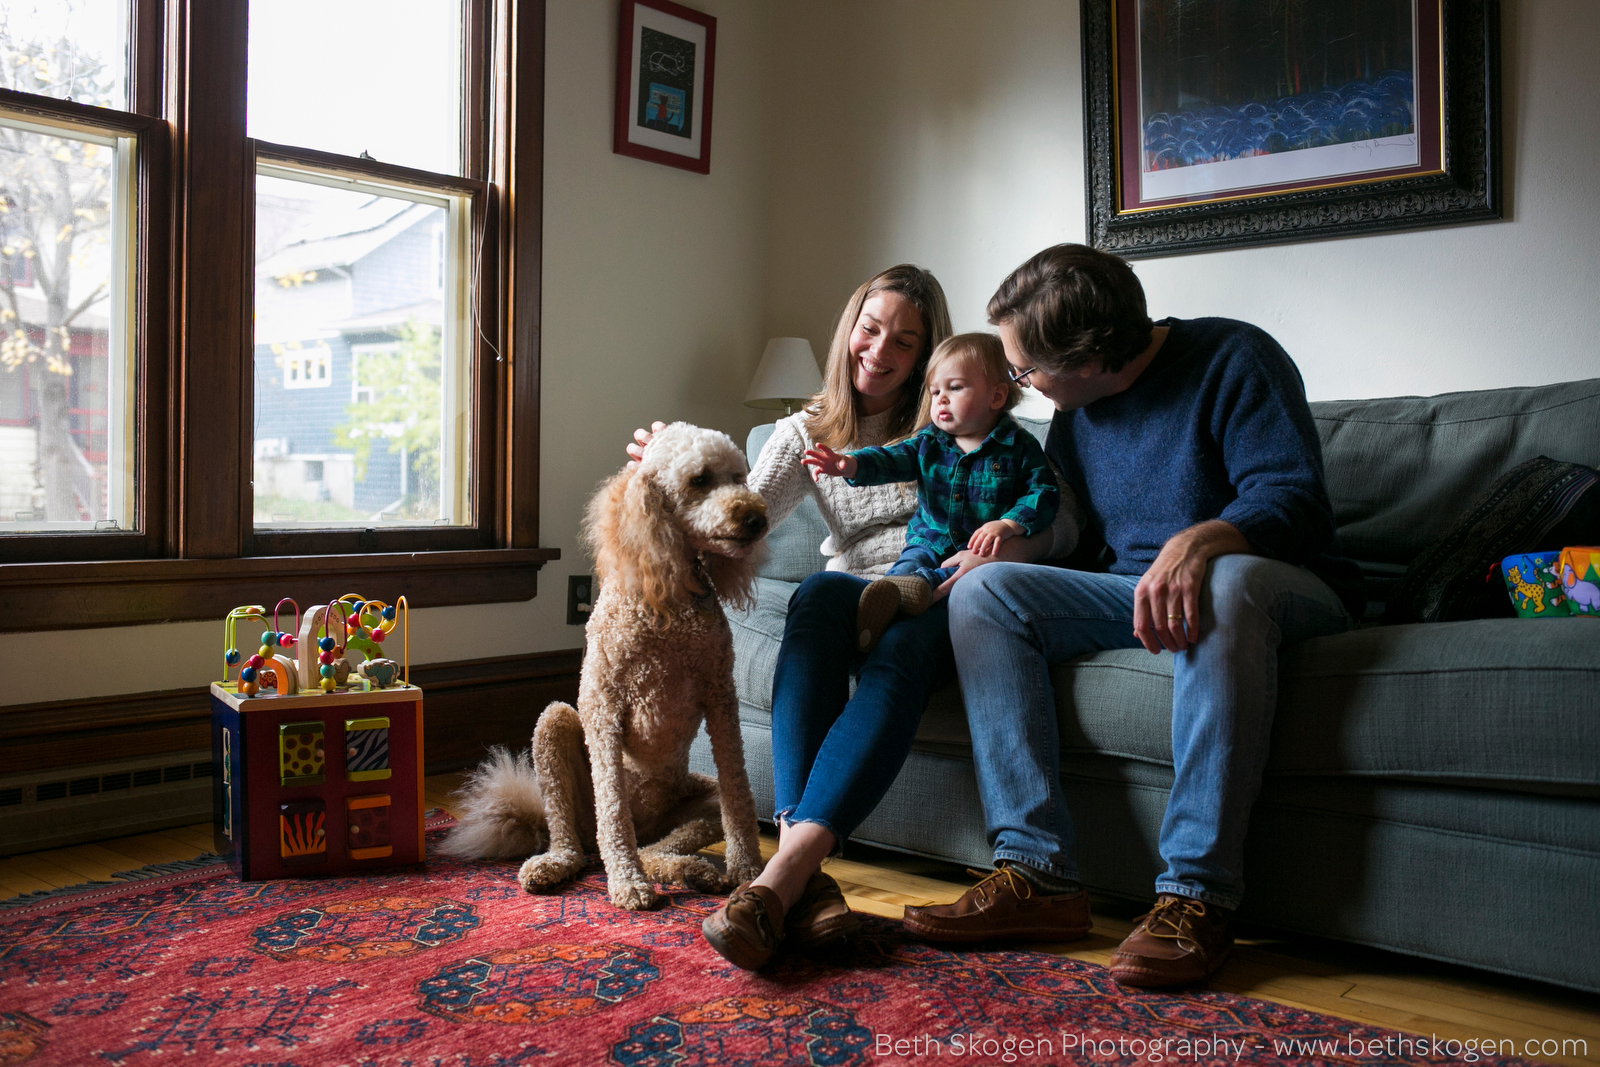 Beth Skogen Photography - Family